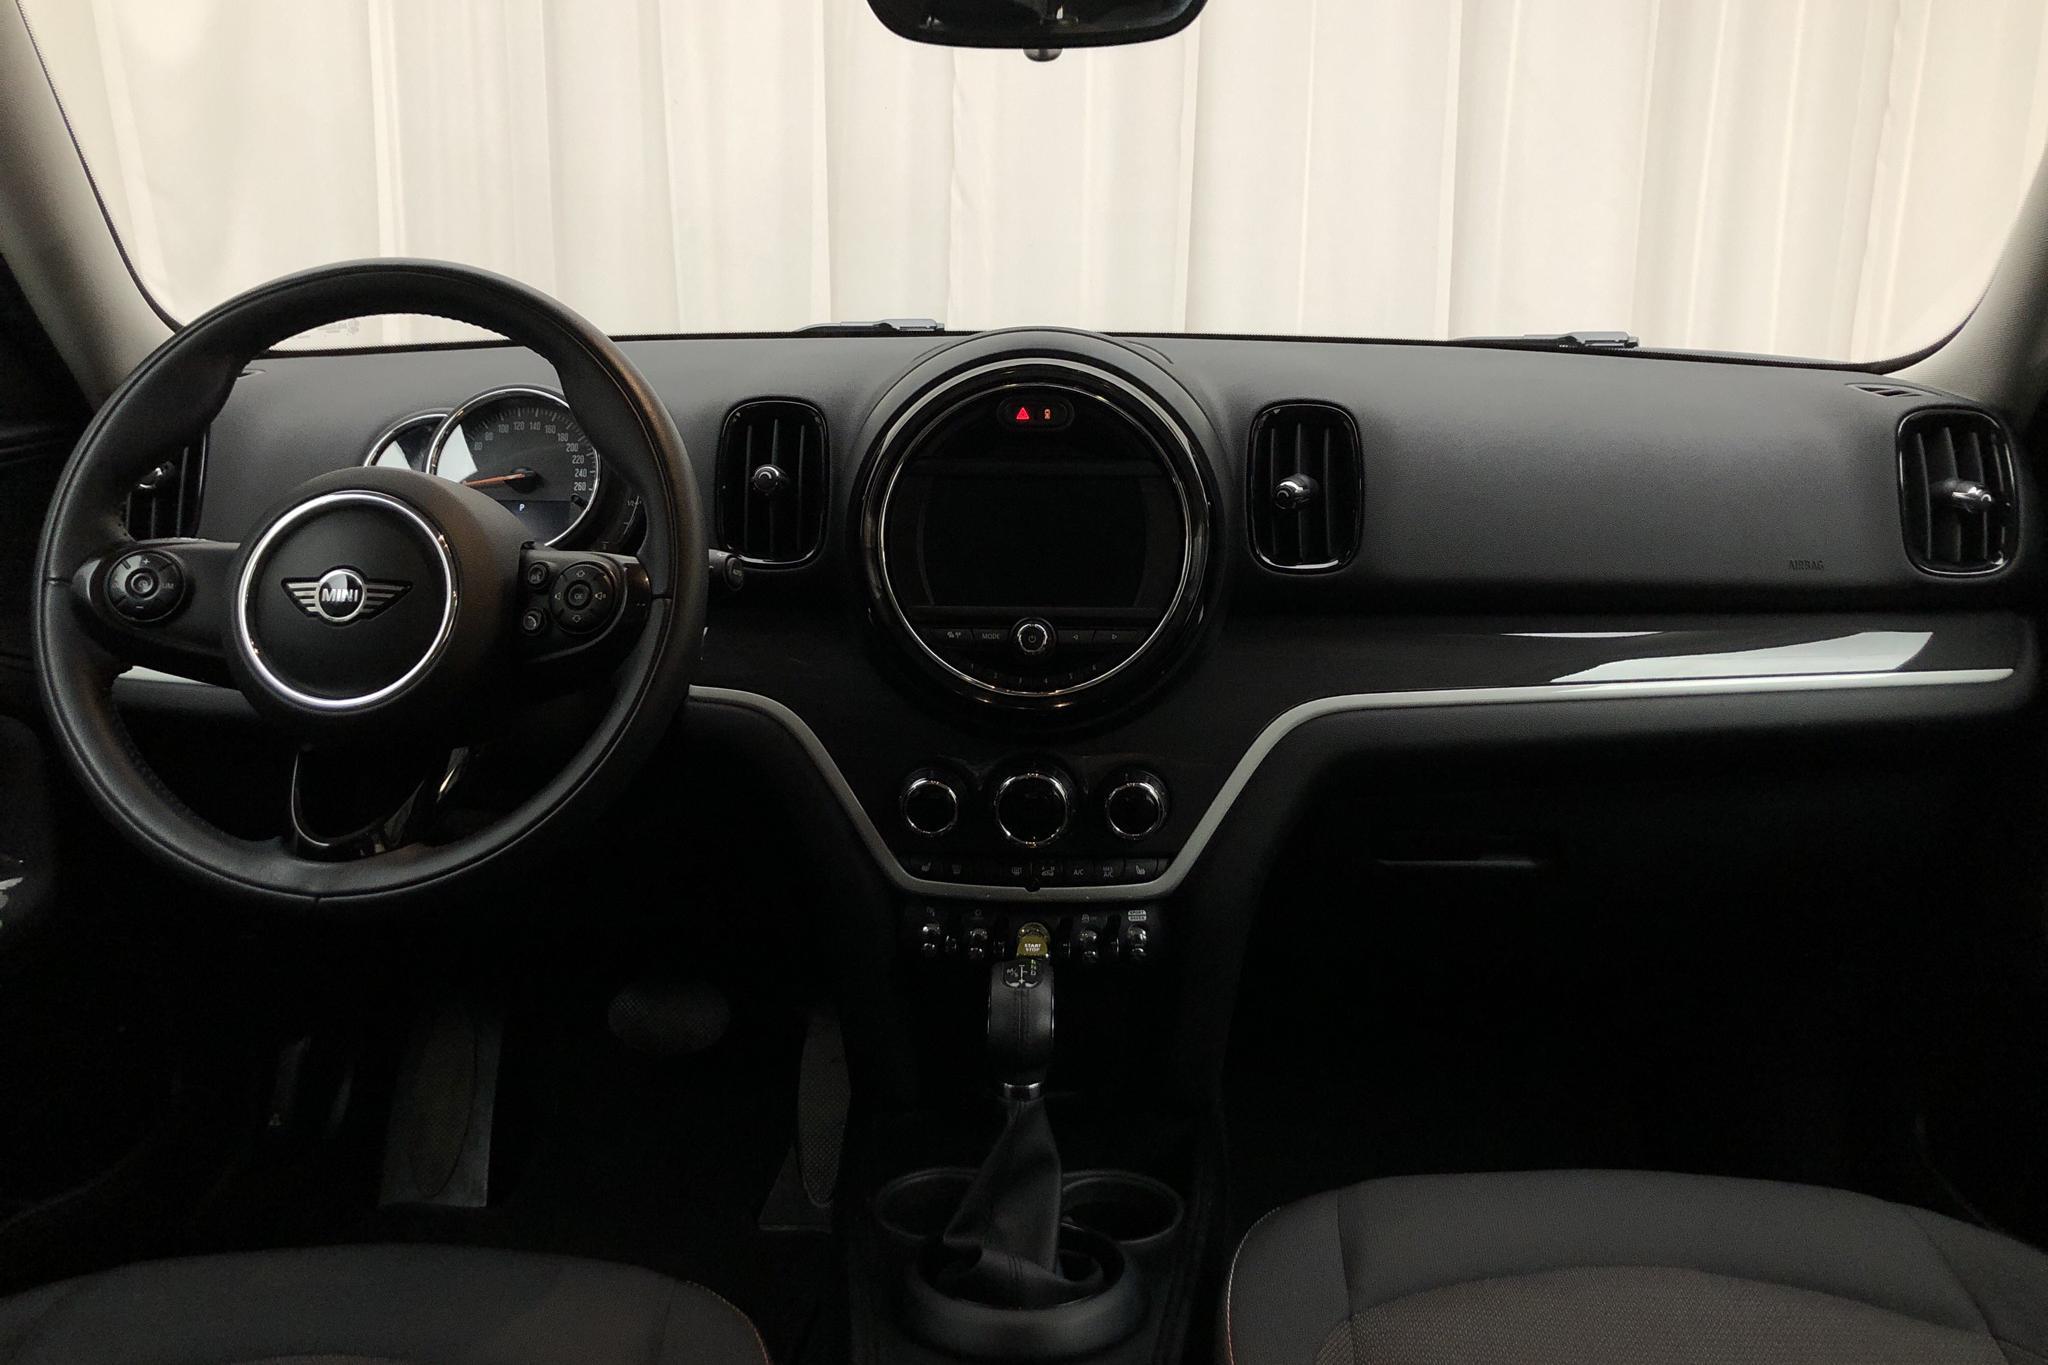 MINI Cooper S E ALL4 Countryman, F60 (224hk) - 5 623 mil - Automat - grön - 2019